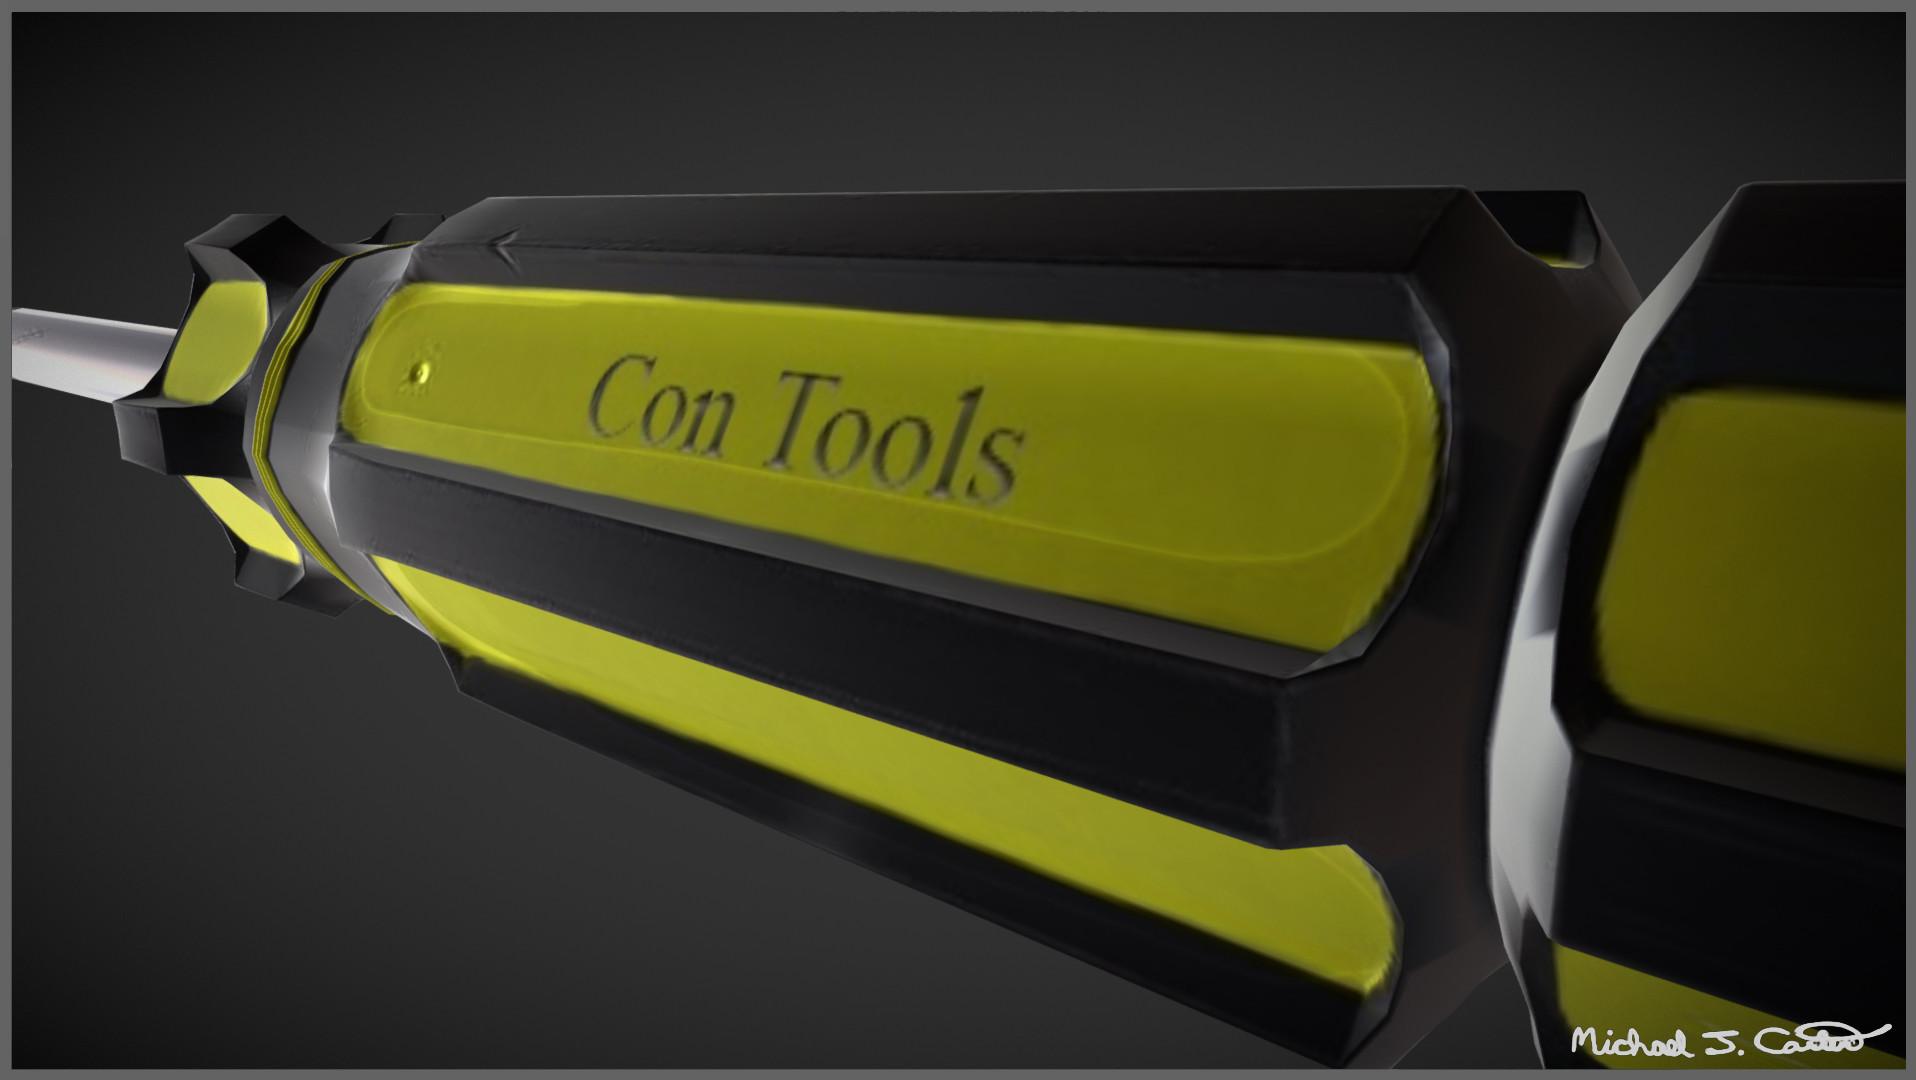 Michael jake carter mcarter screwdriver close up image